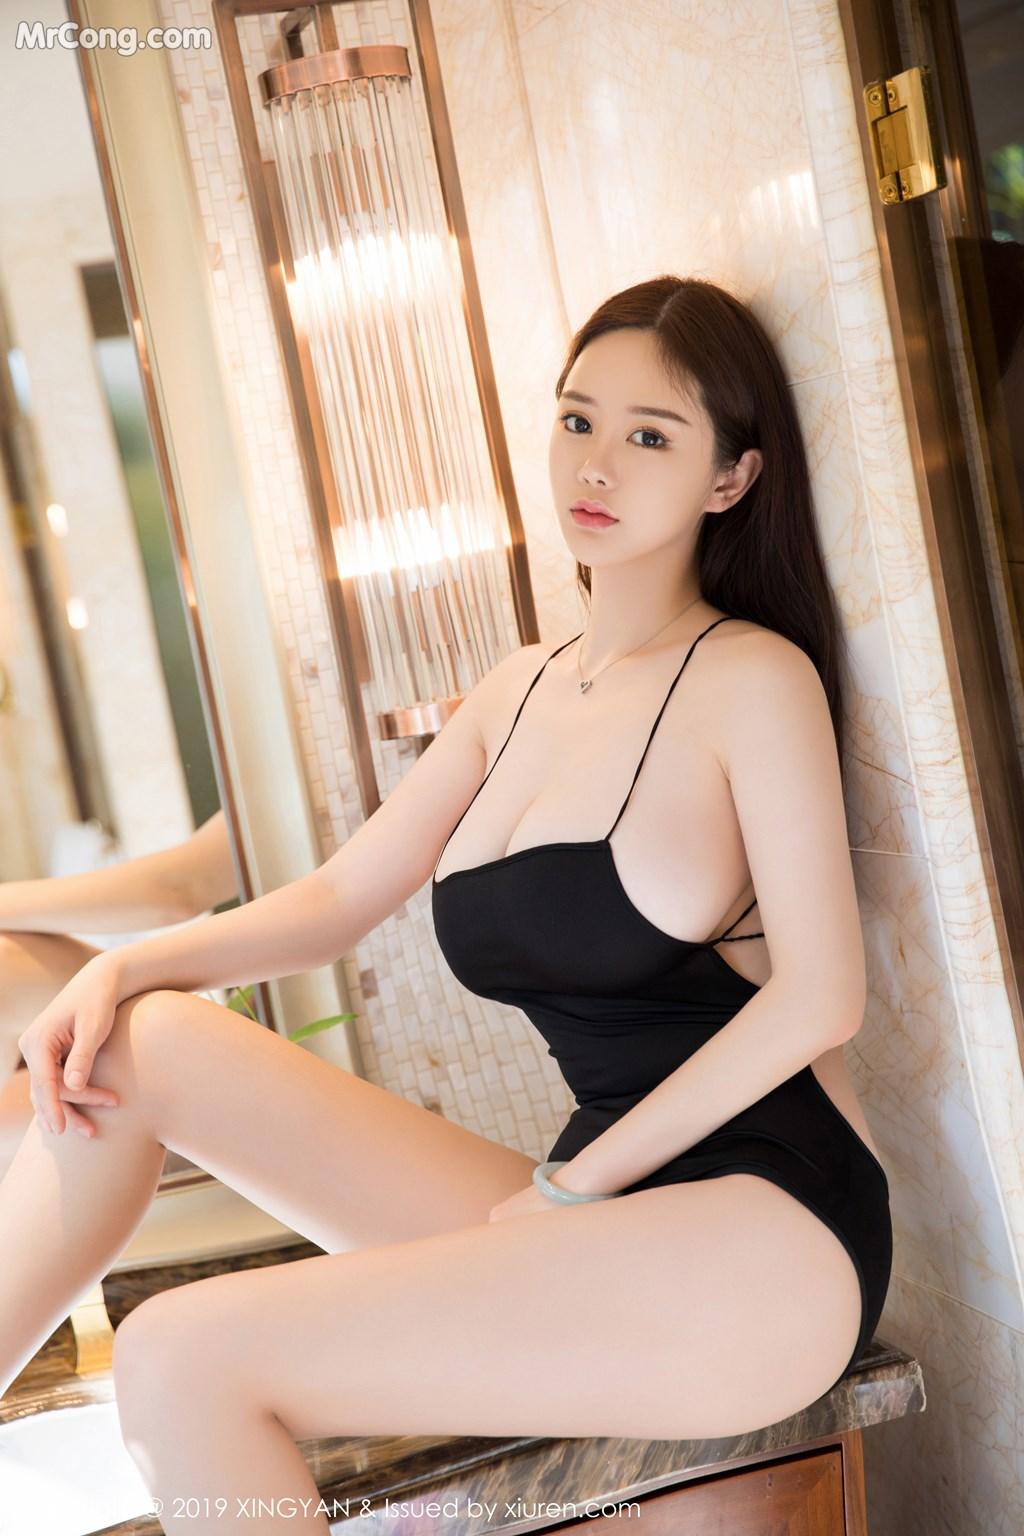 Image XingYan-Vol.124-Silvia-MrCong.com-024 in post XingYan Vol.124: 易阳Silvia (44 ảnh)